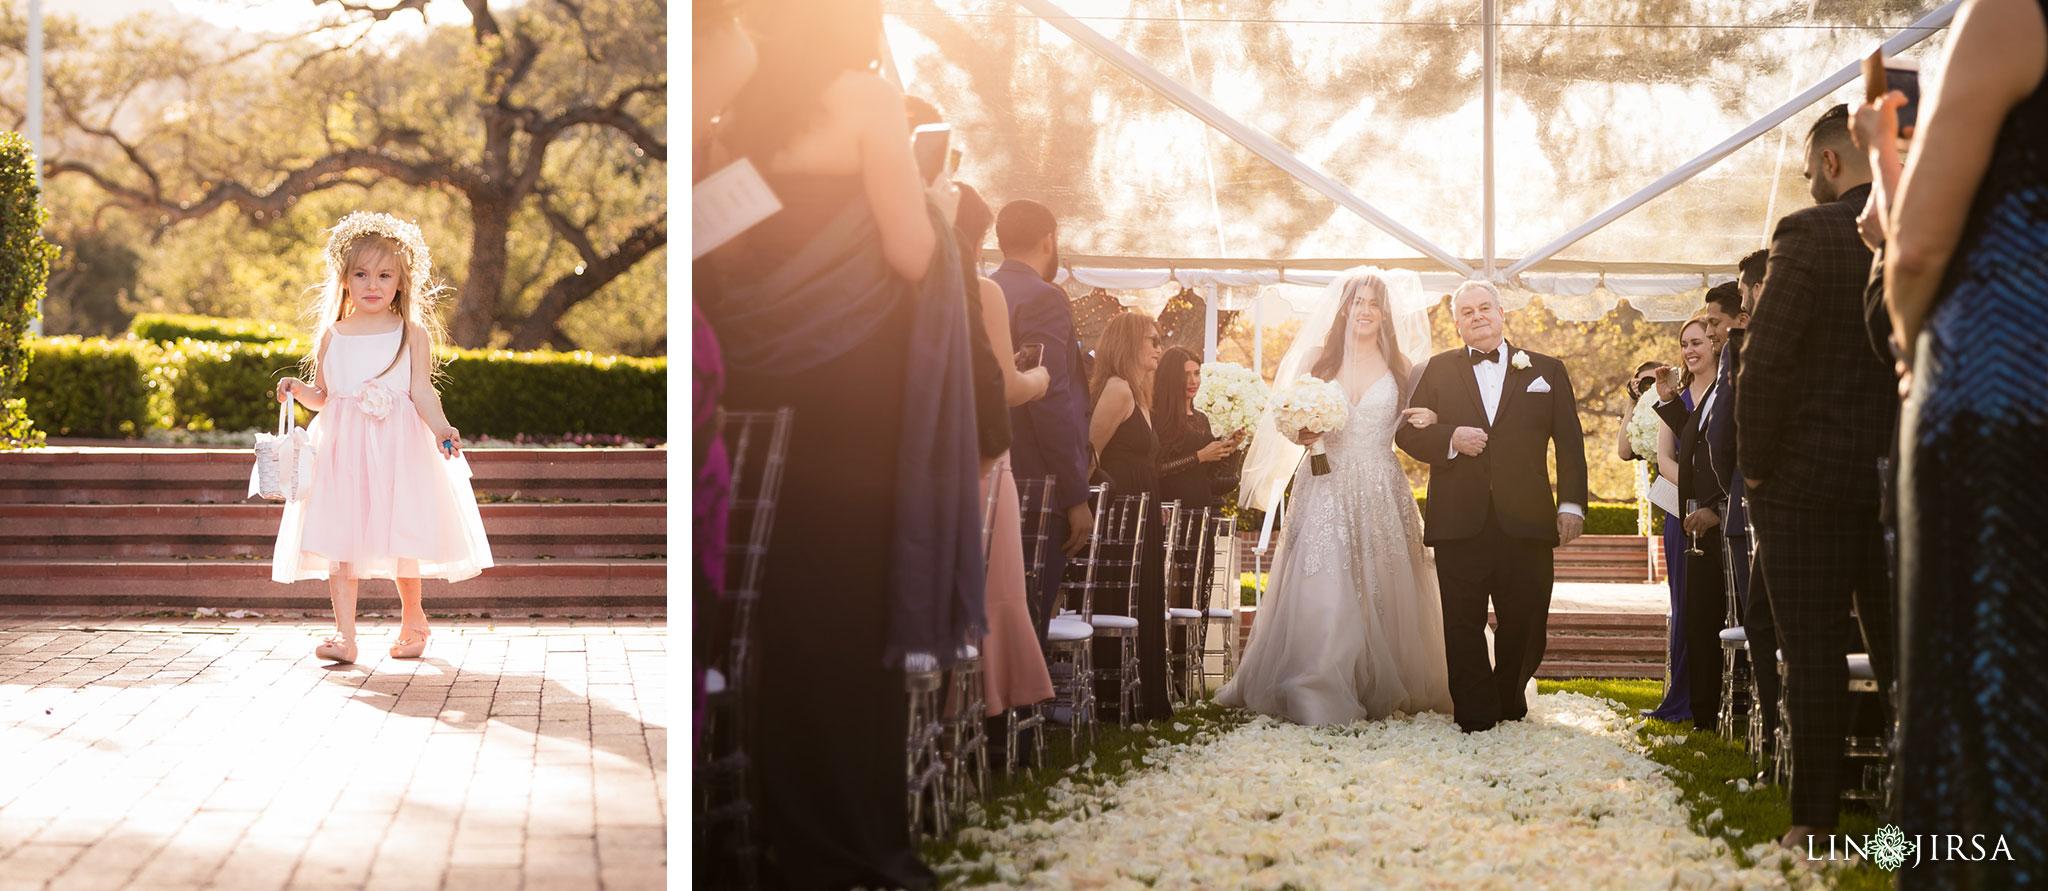 20 sherwood country club ventura county wedding ceremony photography